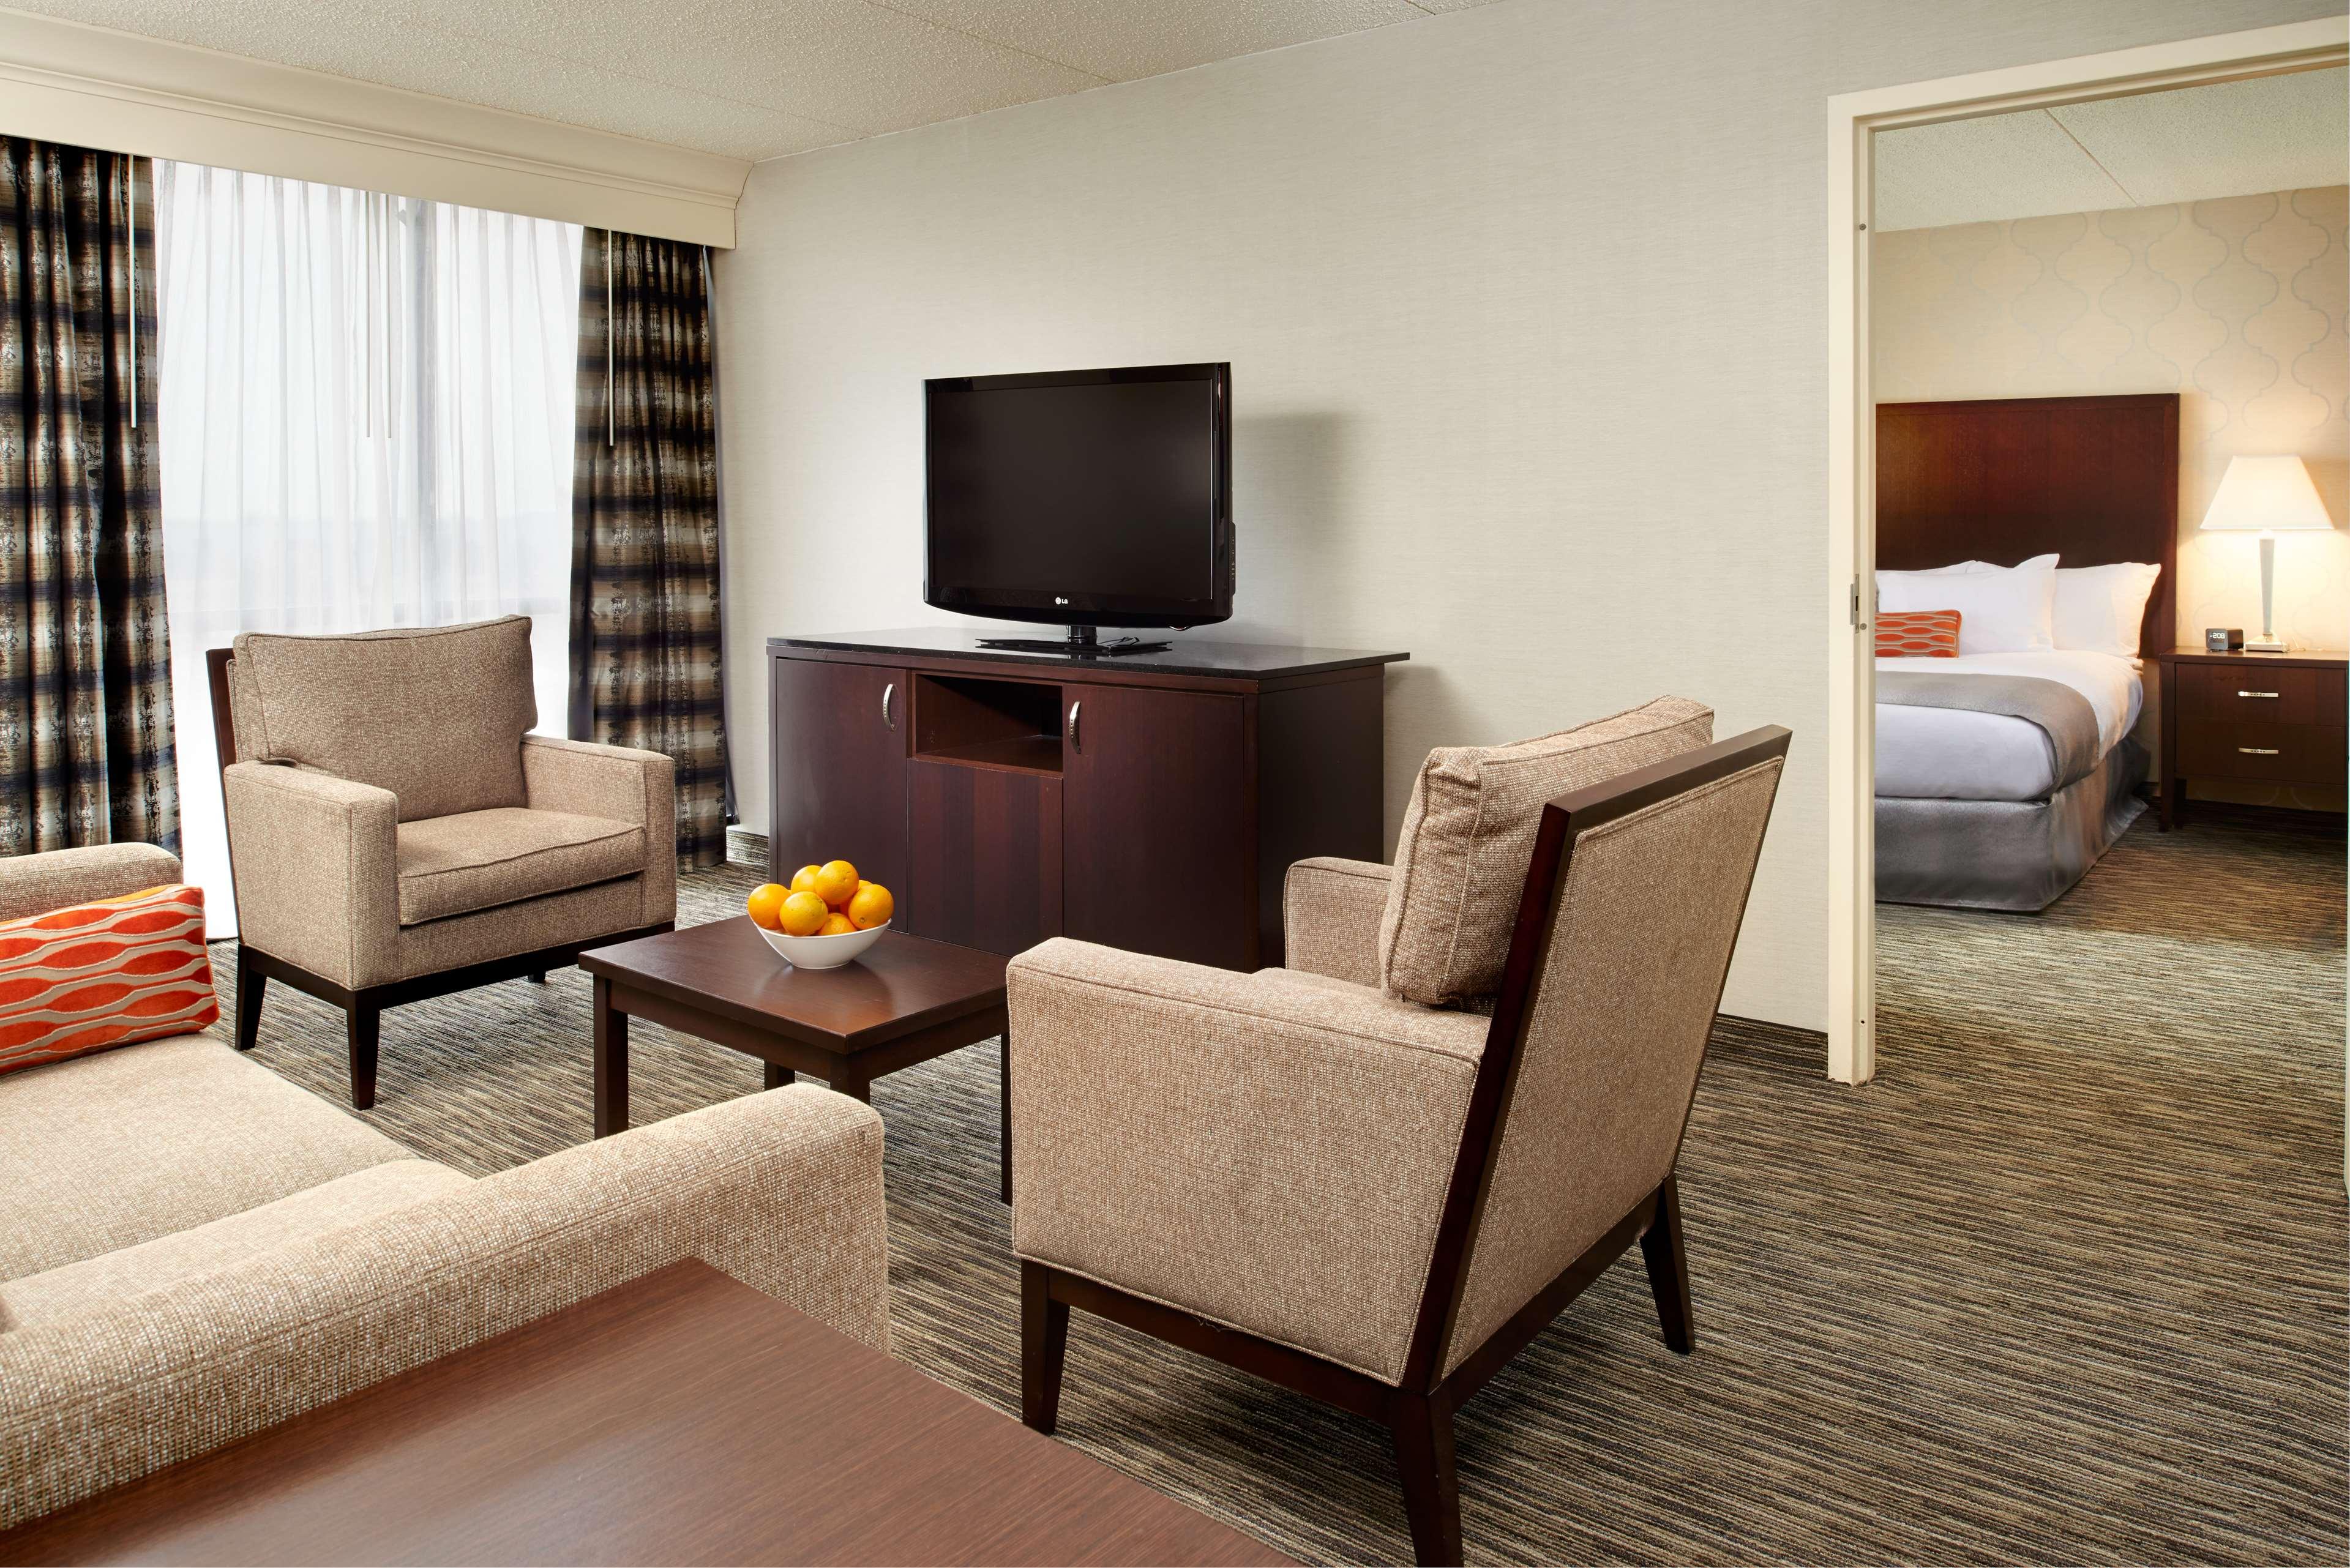 DoubleTree by Hilton Hotel Detroit - Dearborn image 18